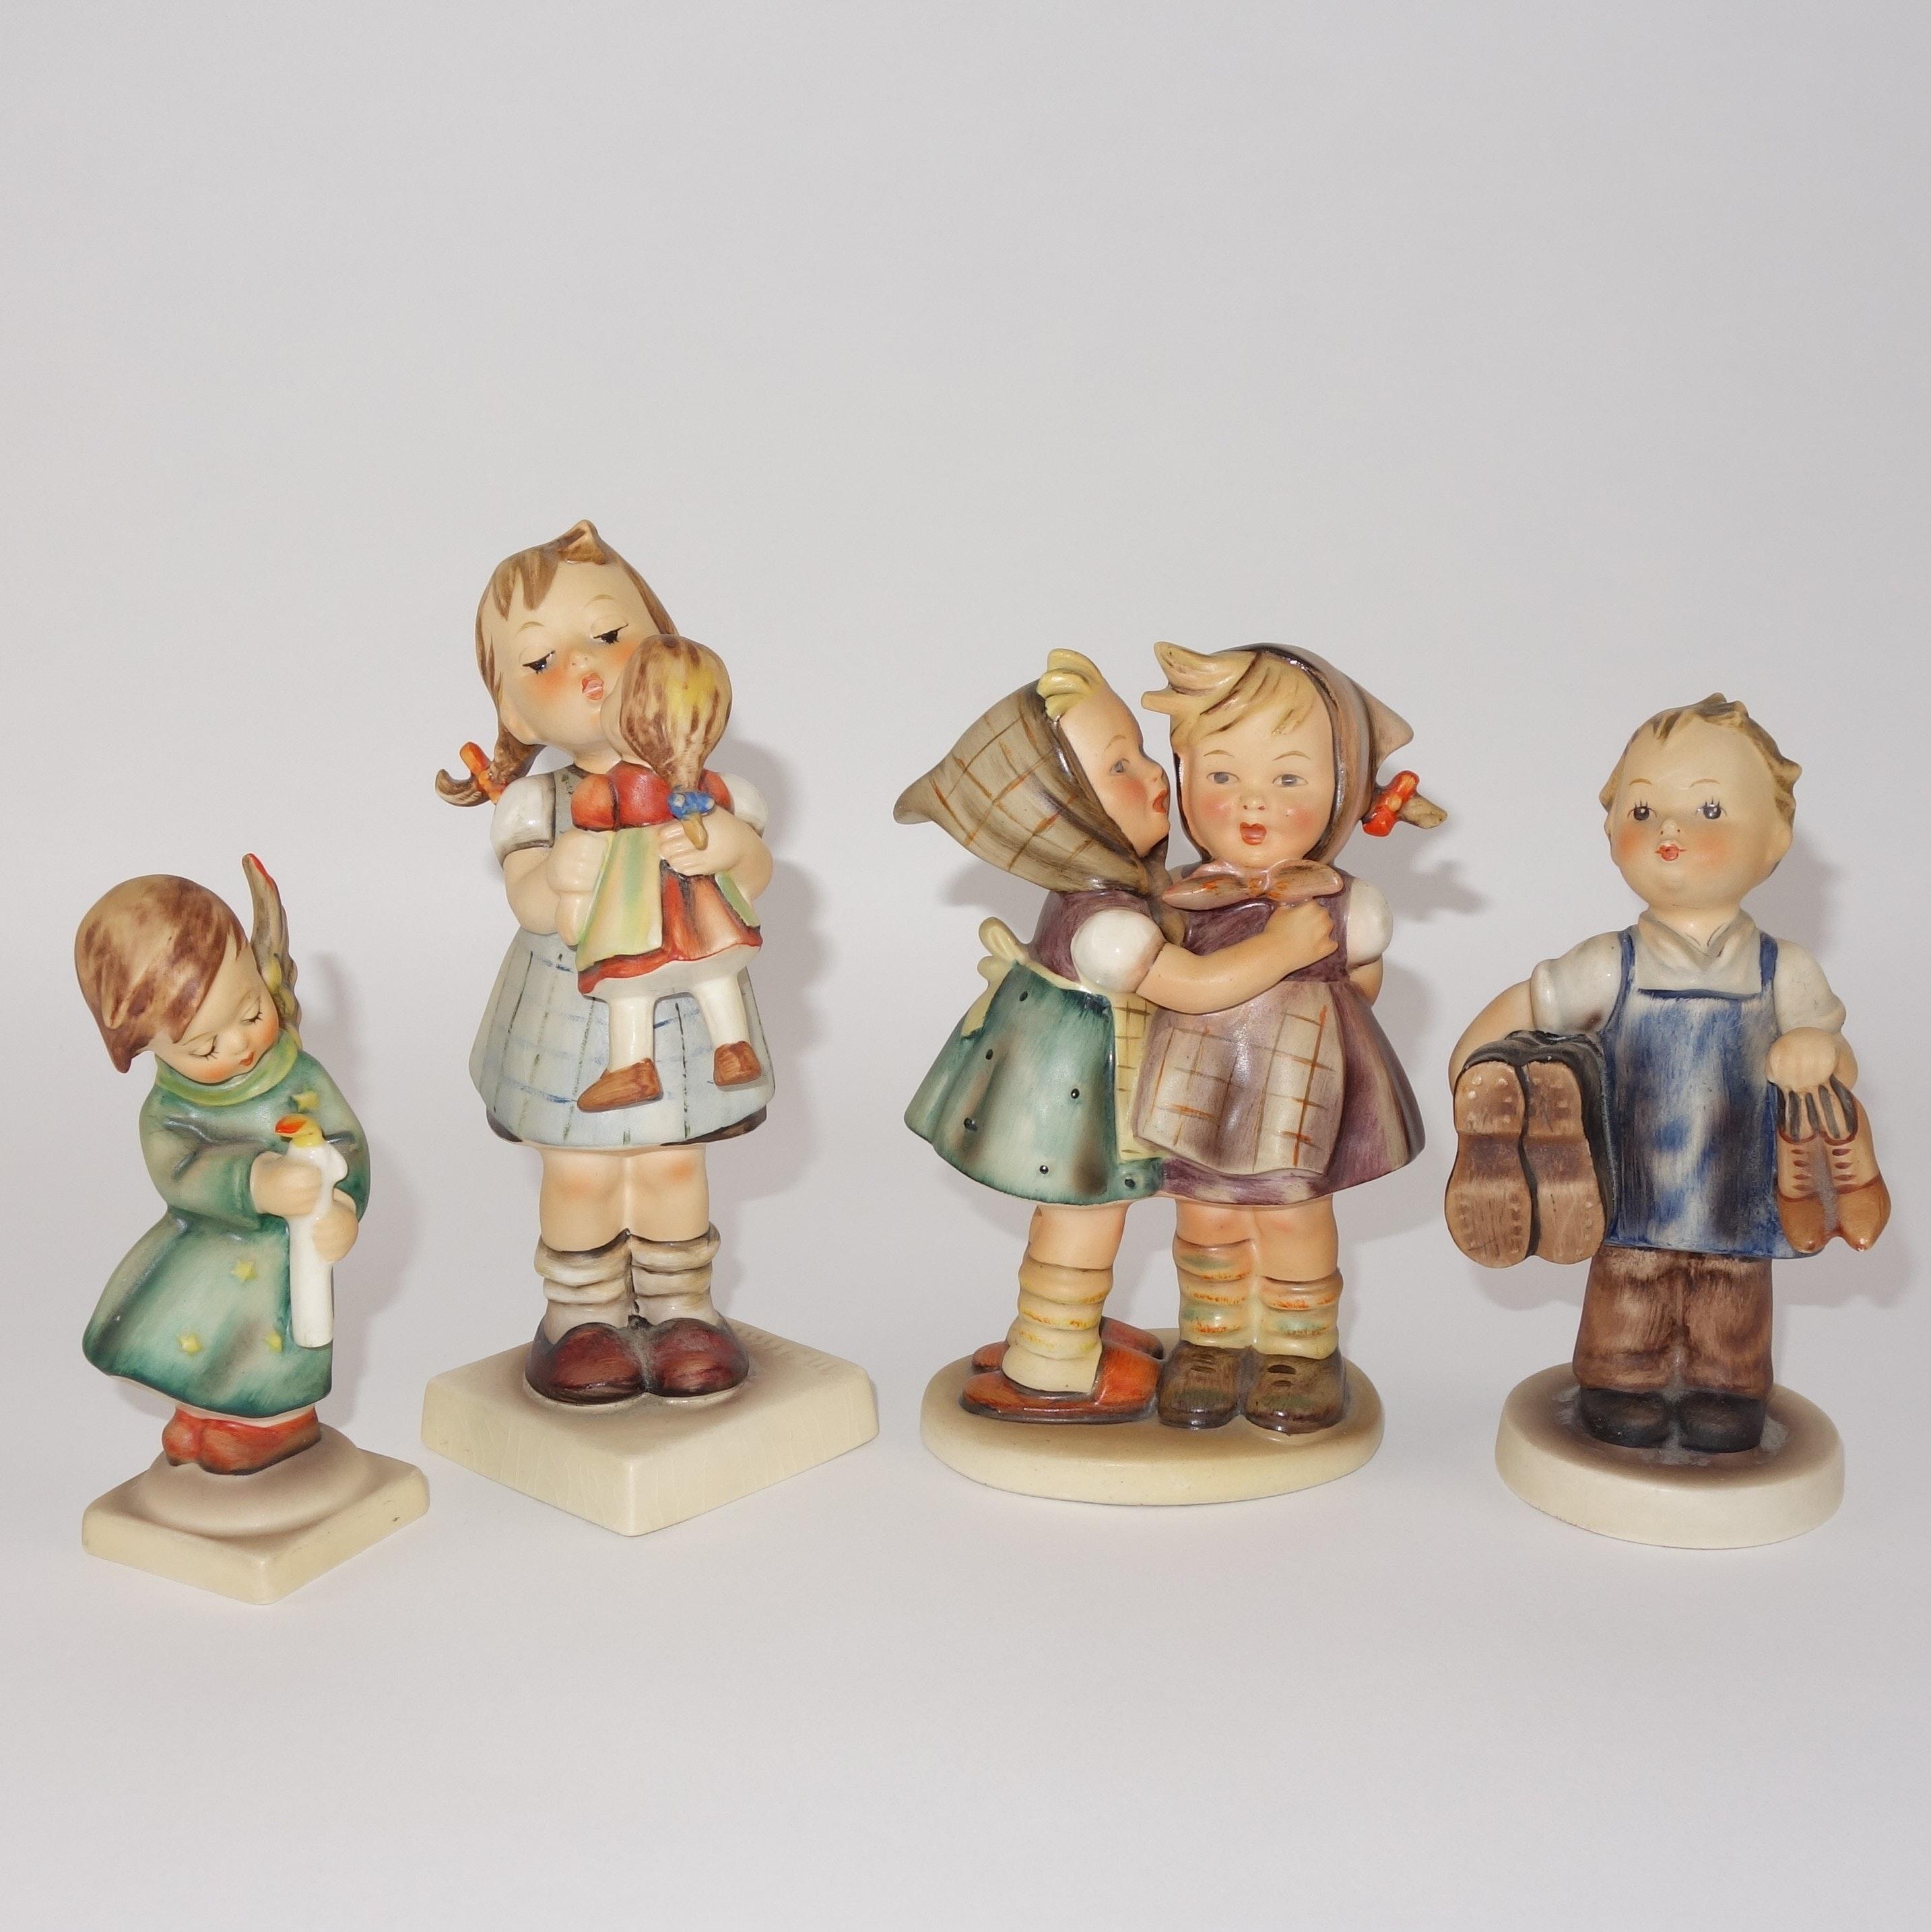 Early Hummel Figurines